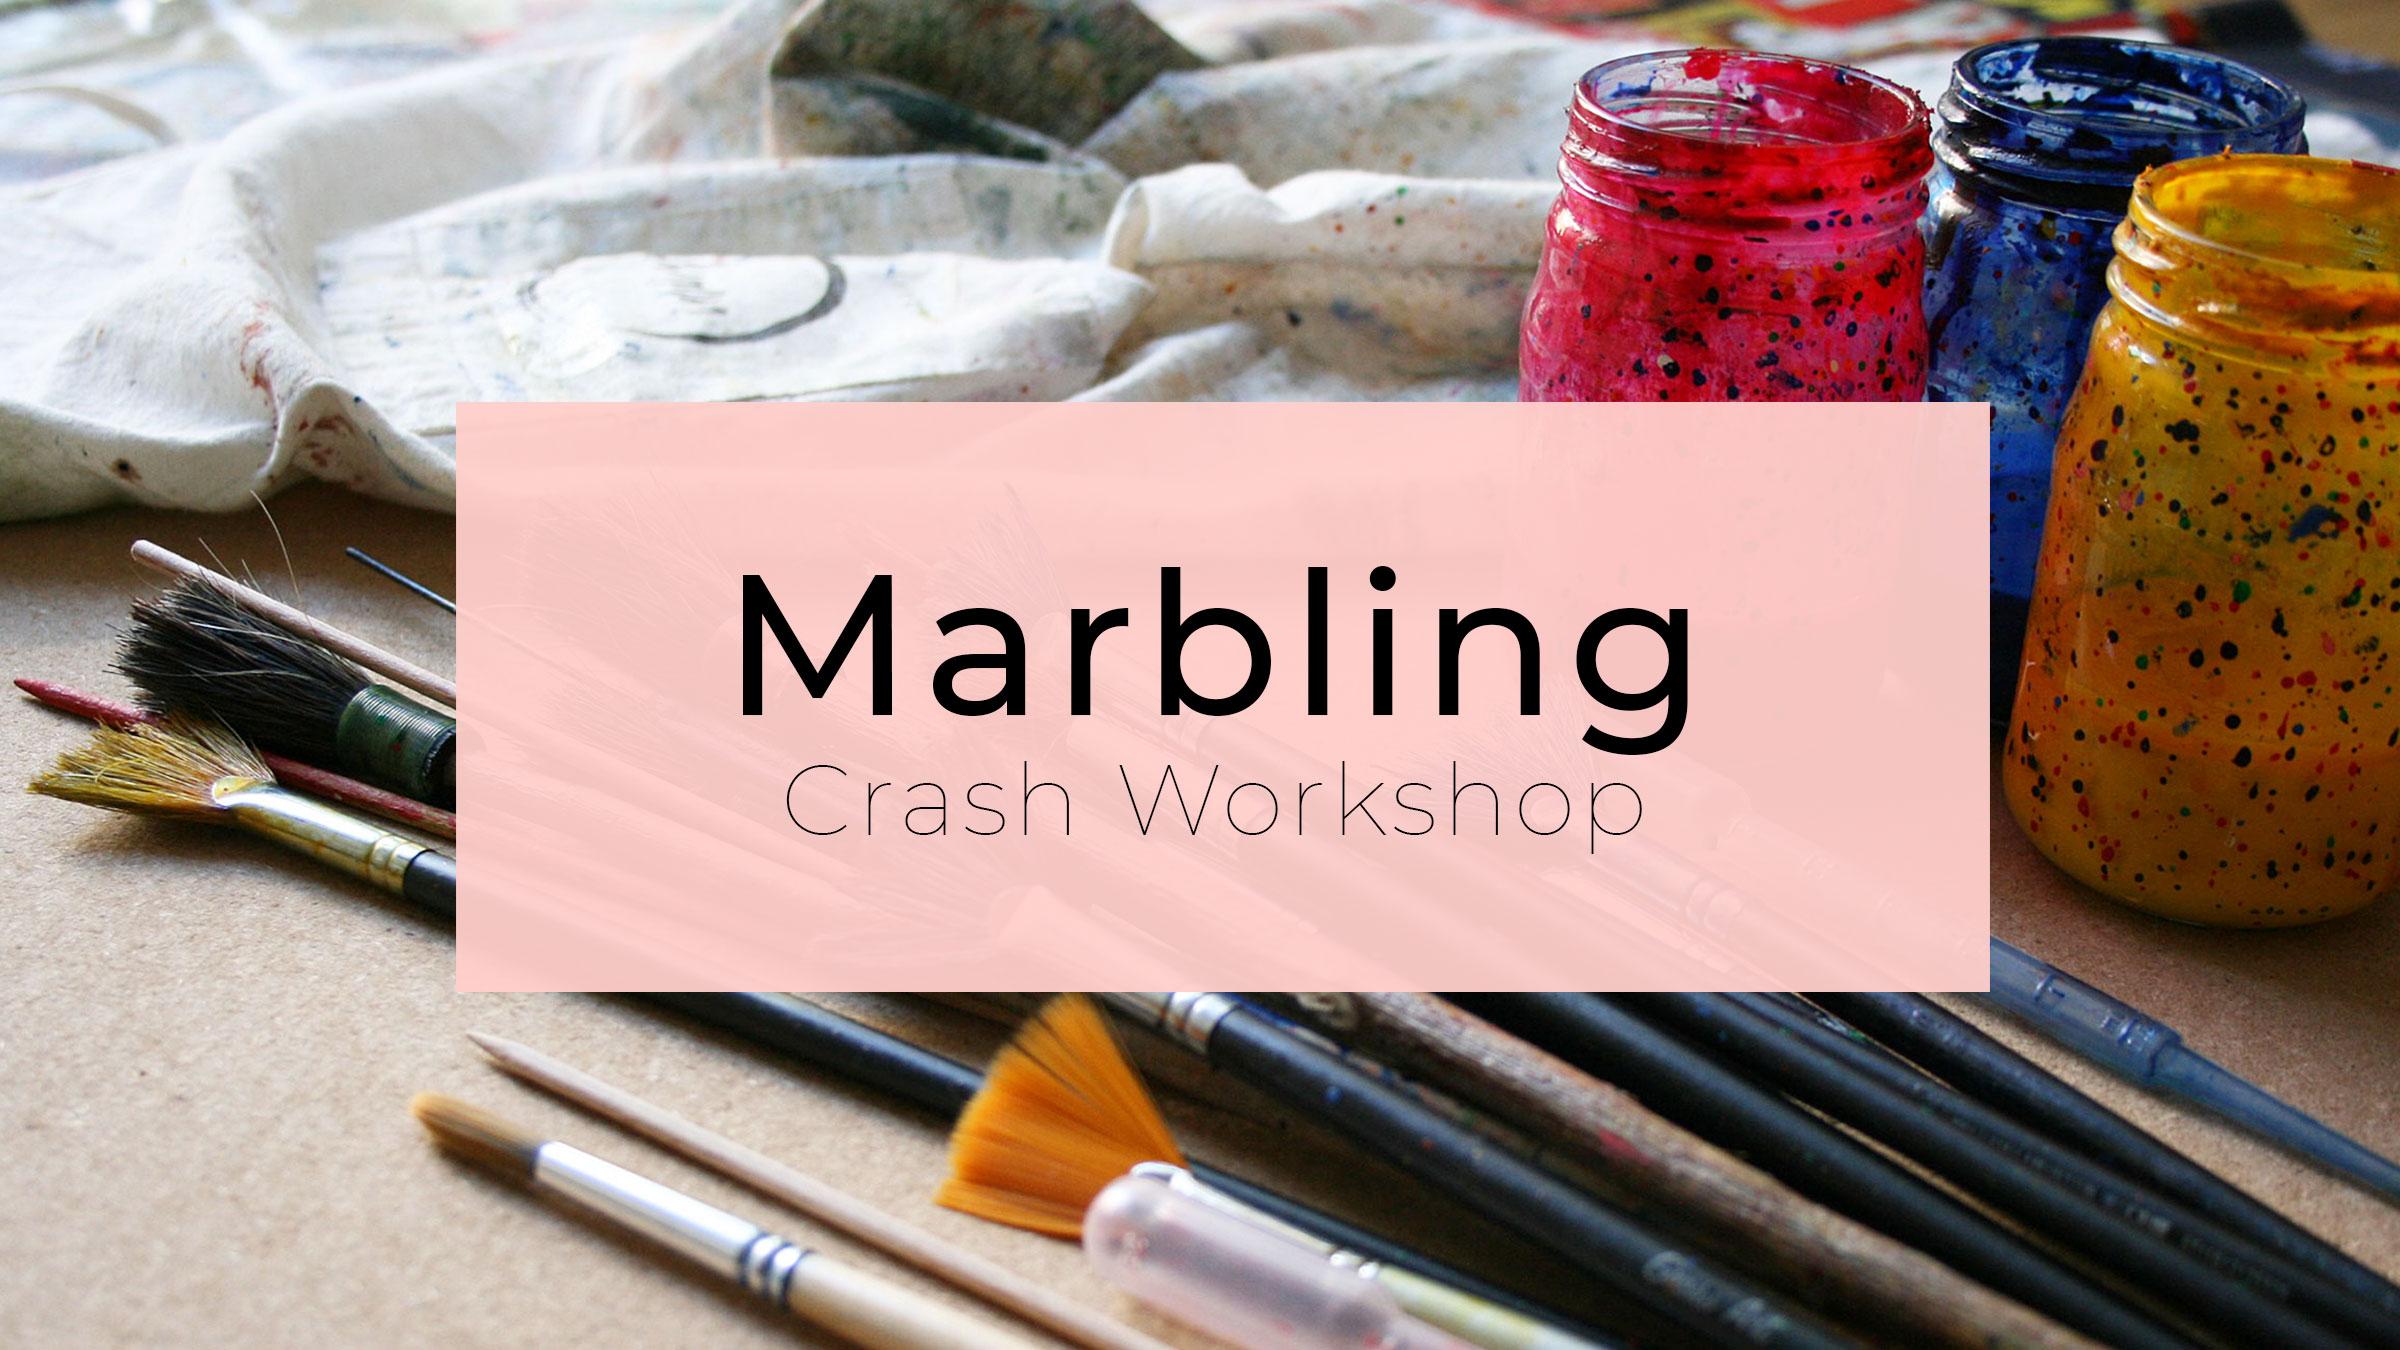 marbling-crash-workshop-indigocraftroom-0